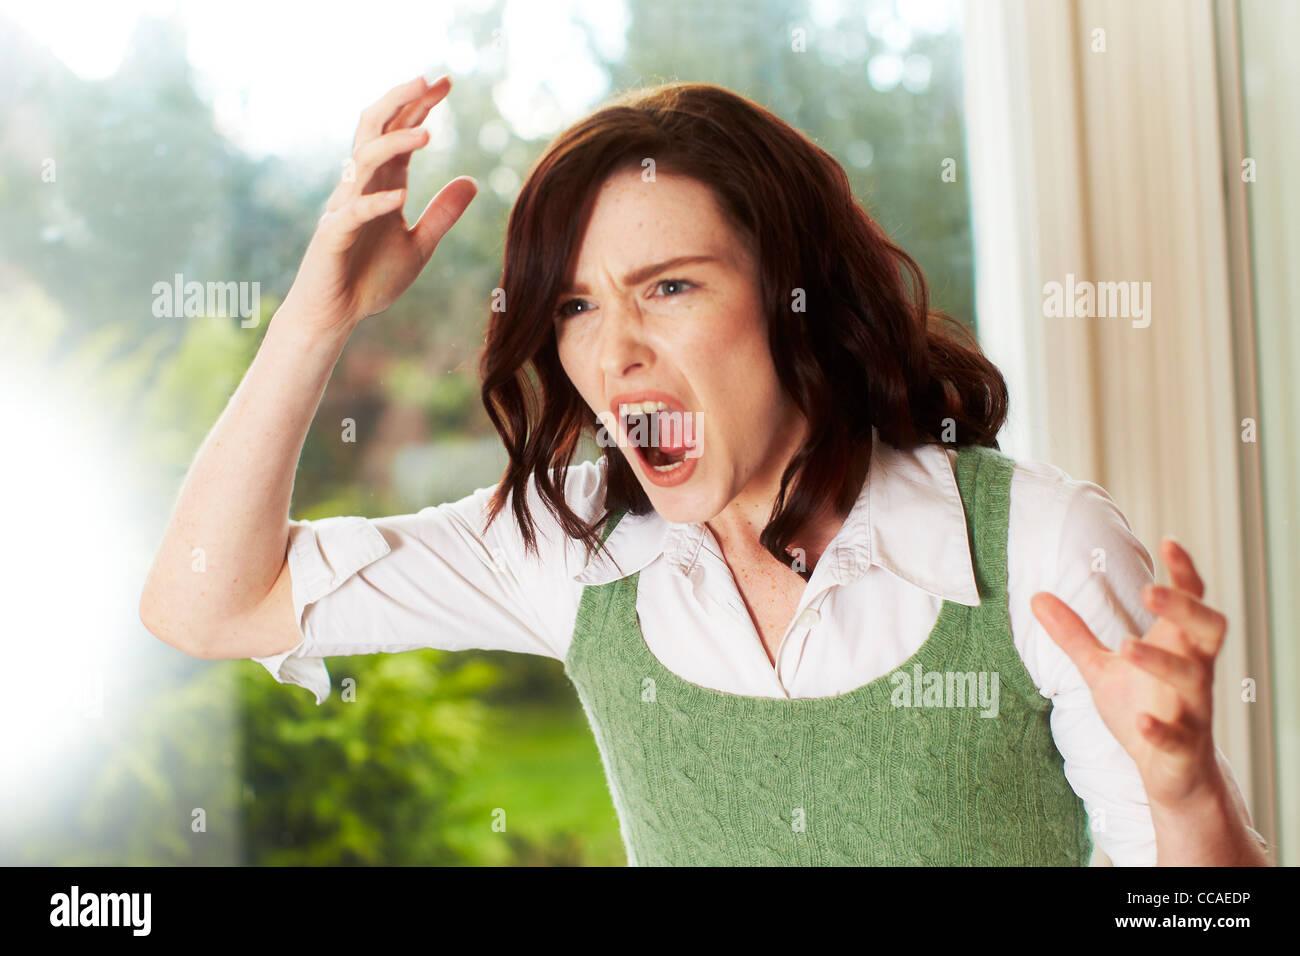 Ragazza arrabbiata Immagini Stock